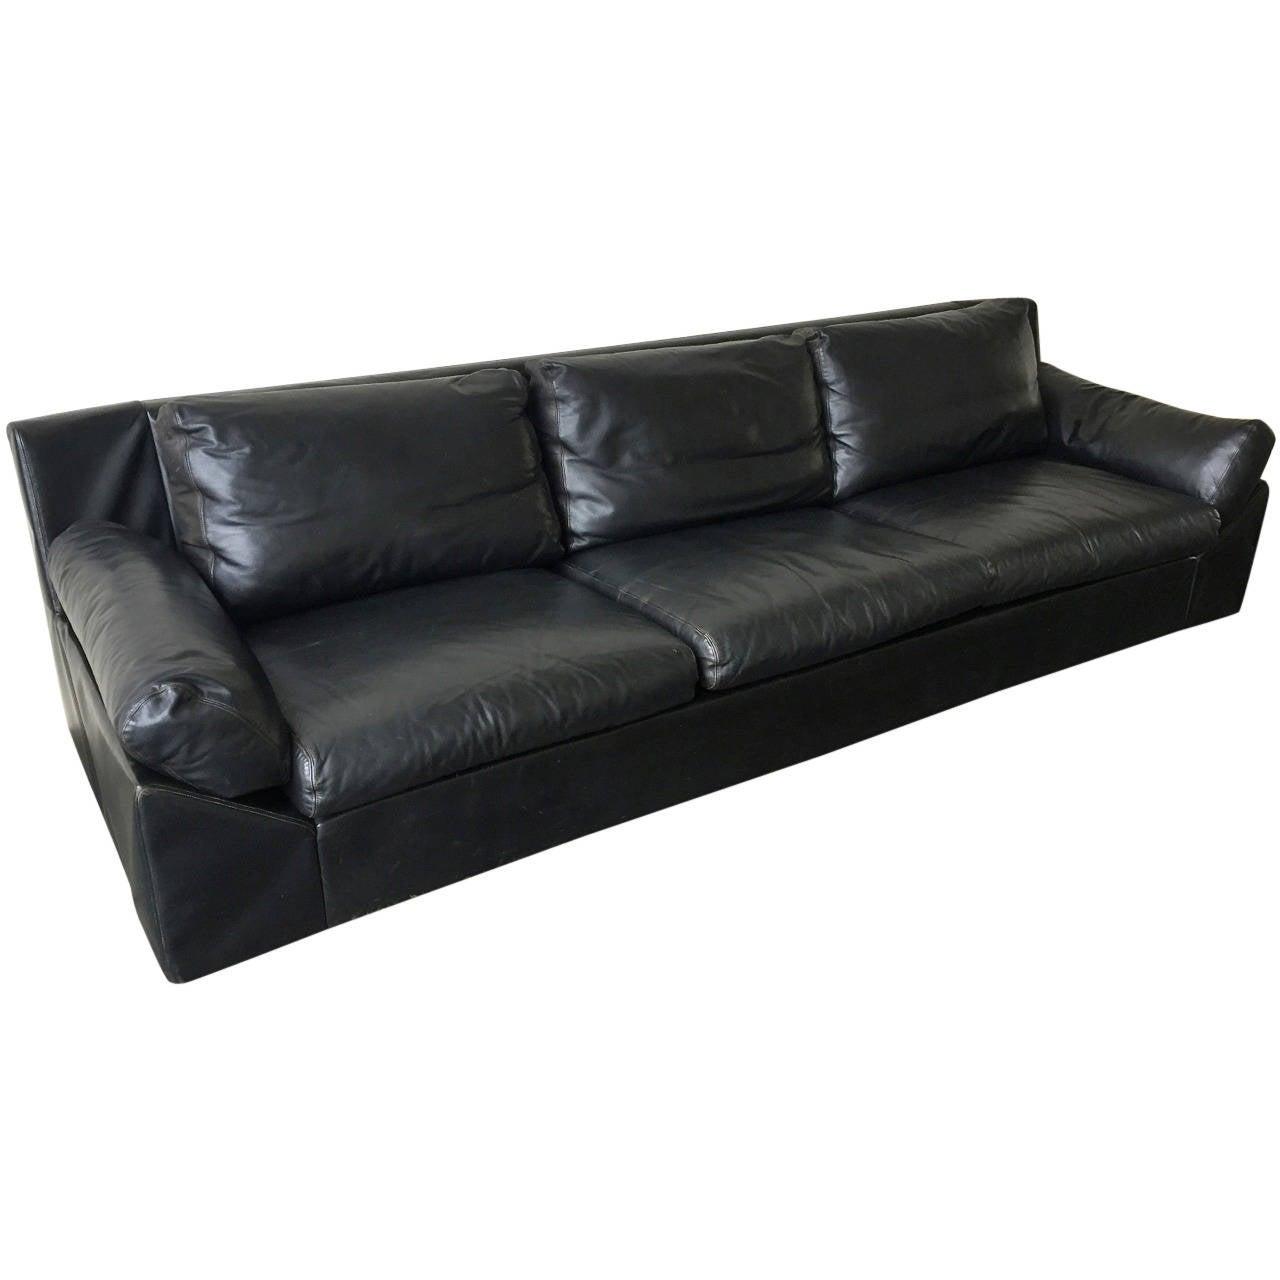 california sofa by edelhard harlis at 1stdibs. Black Bedroom Furniture Sets. Home Design Ideas